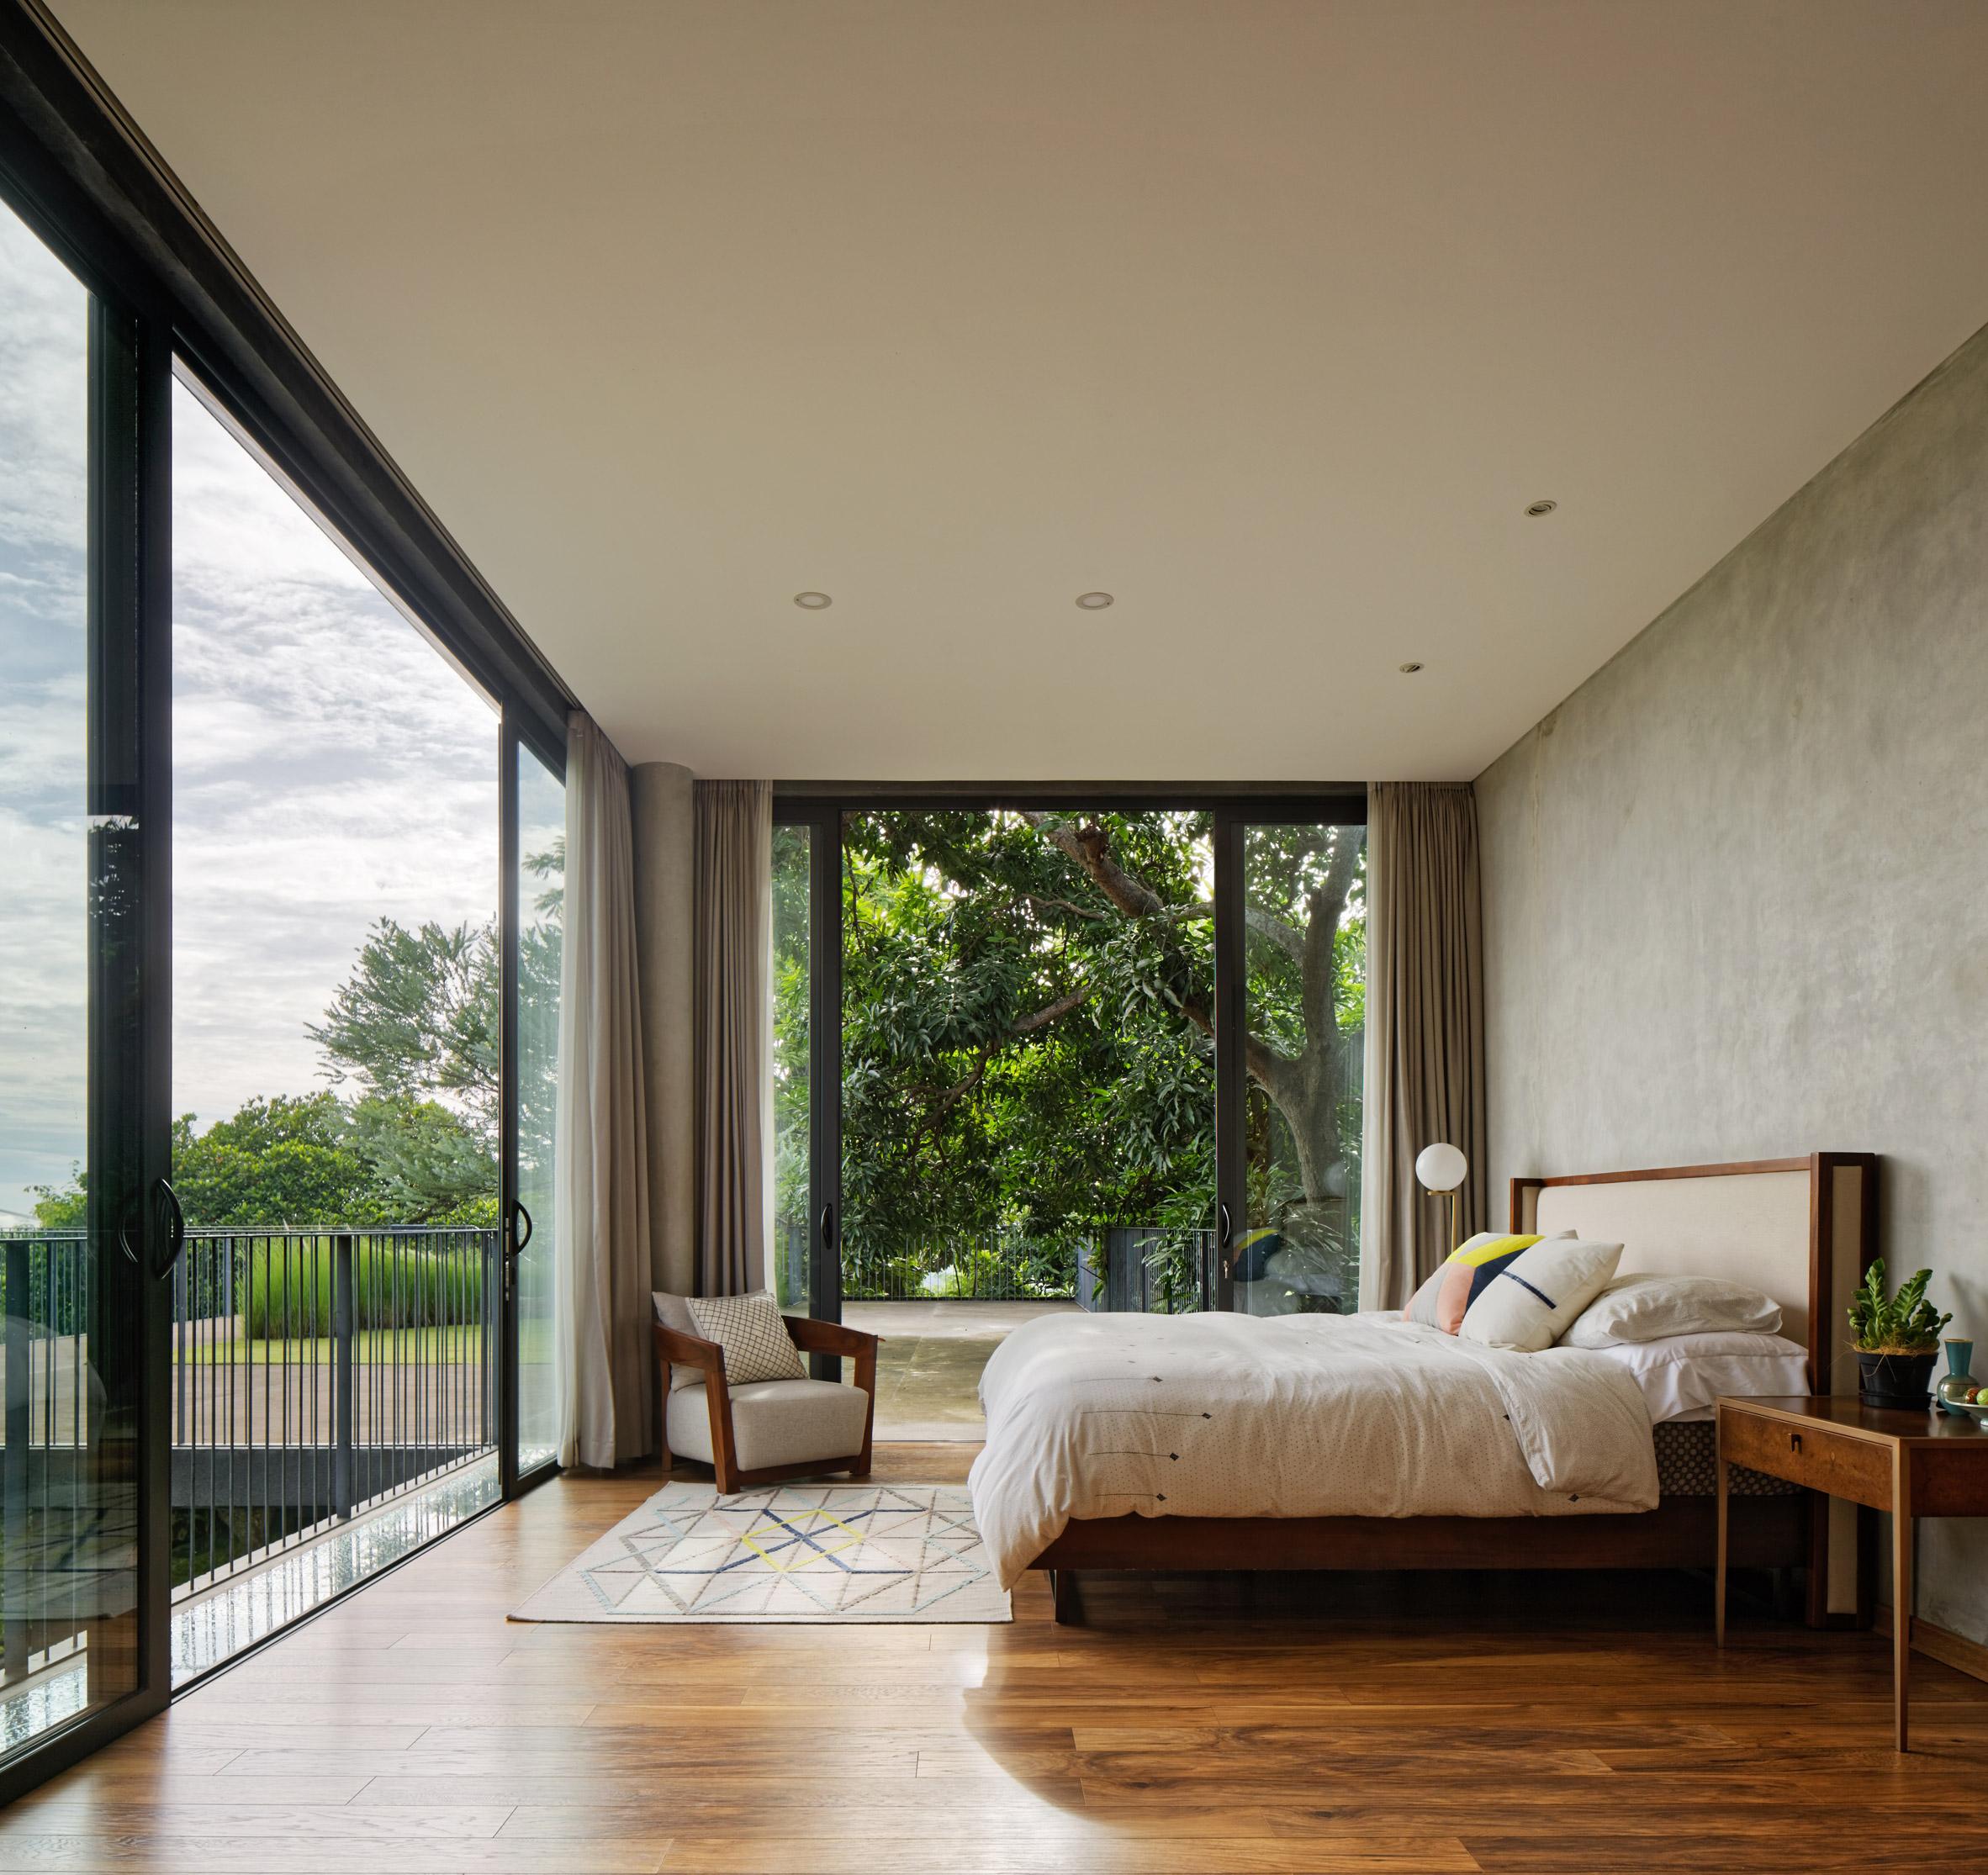 house-inside-outside-tamara-wibowo-architecture-residential-indonesia_dezeen_2364_col_18.jpg